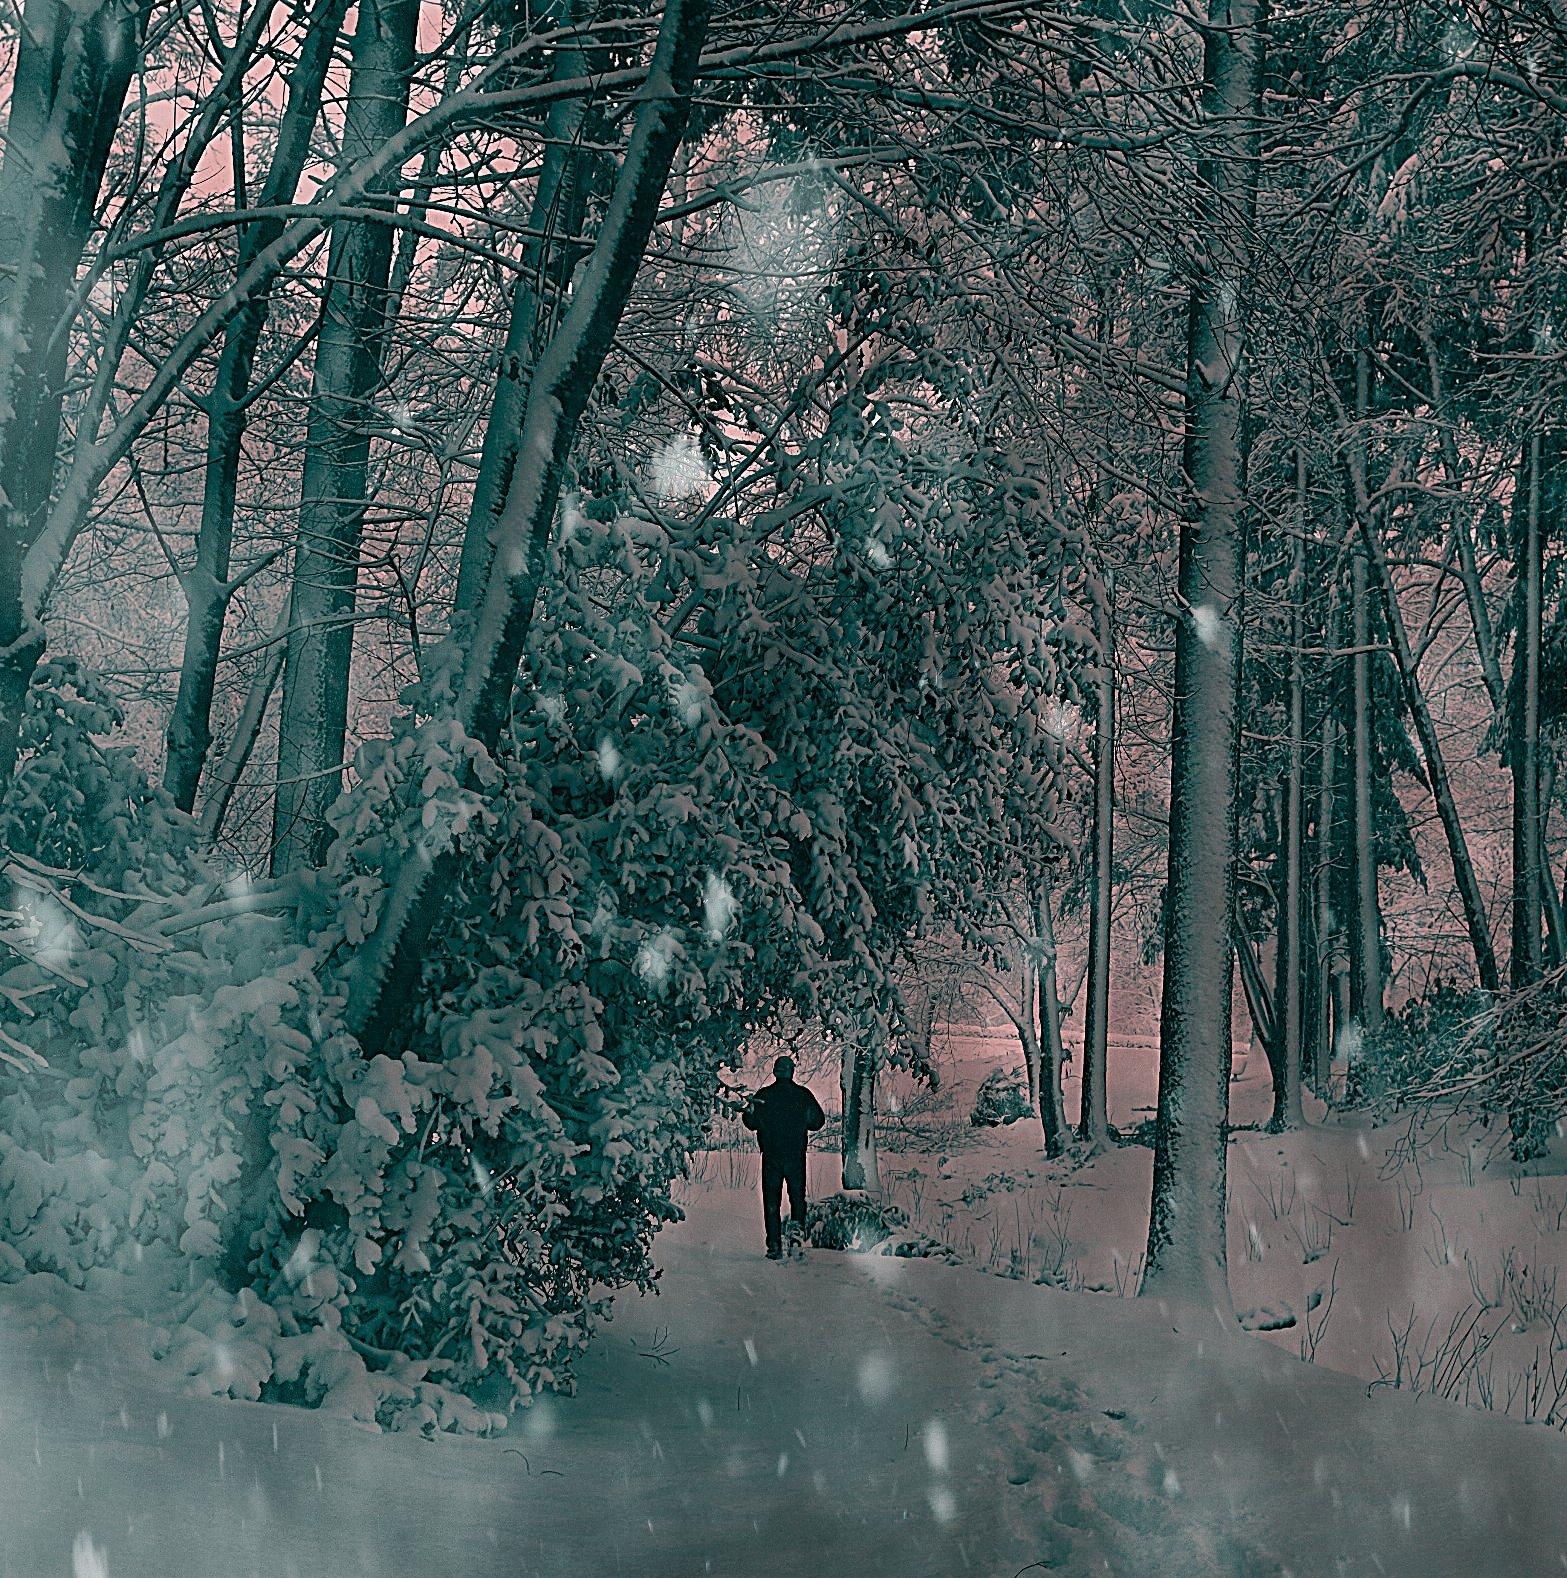 Winter Wonderland: Snowed In in Portland, Oregon